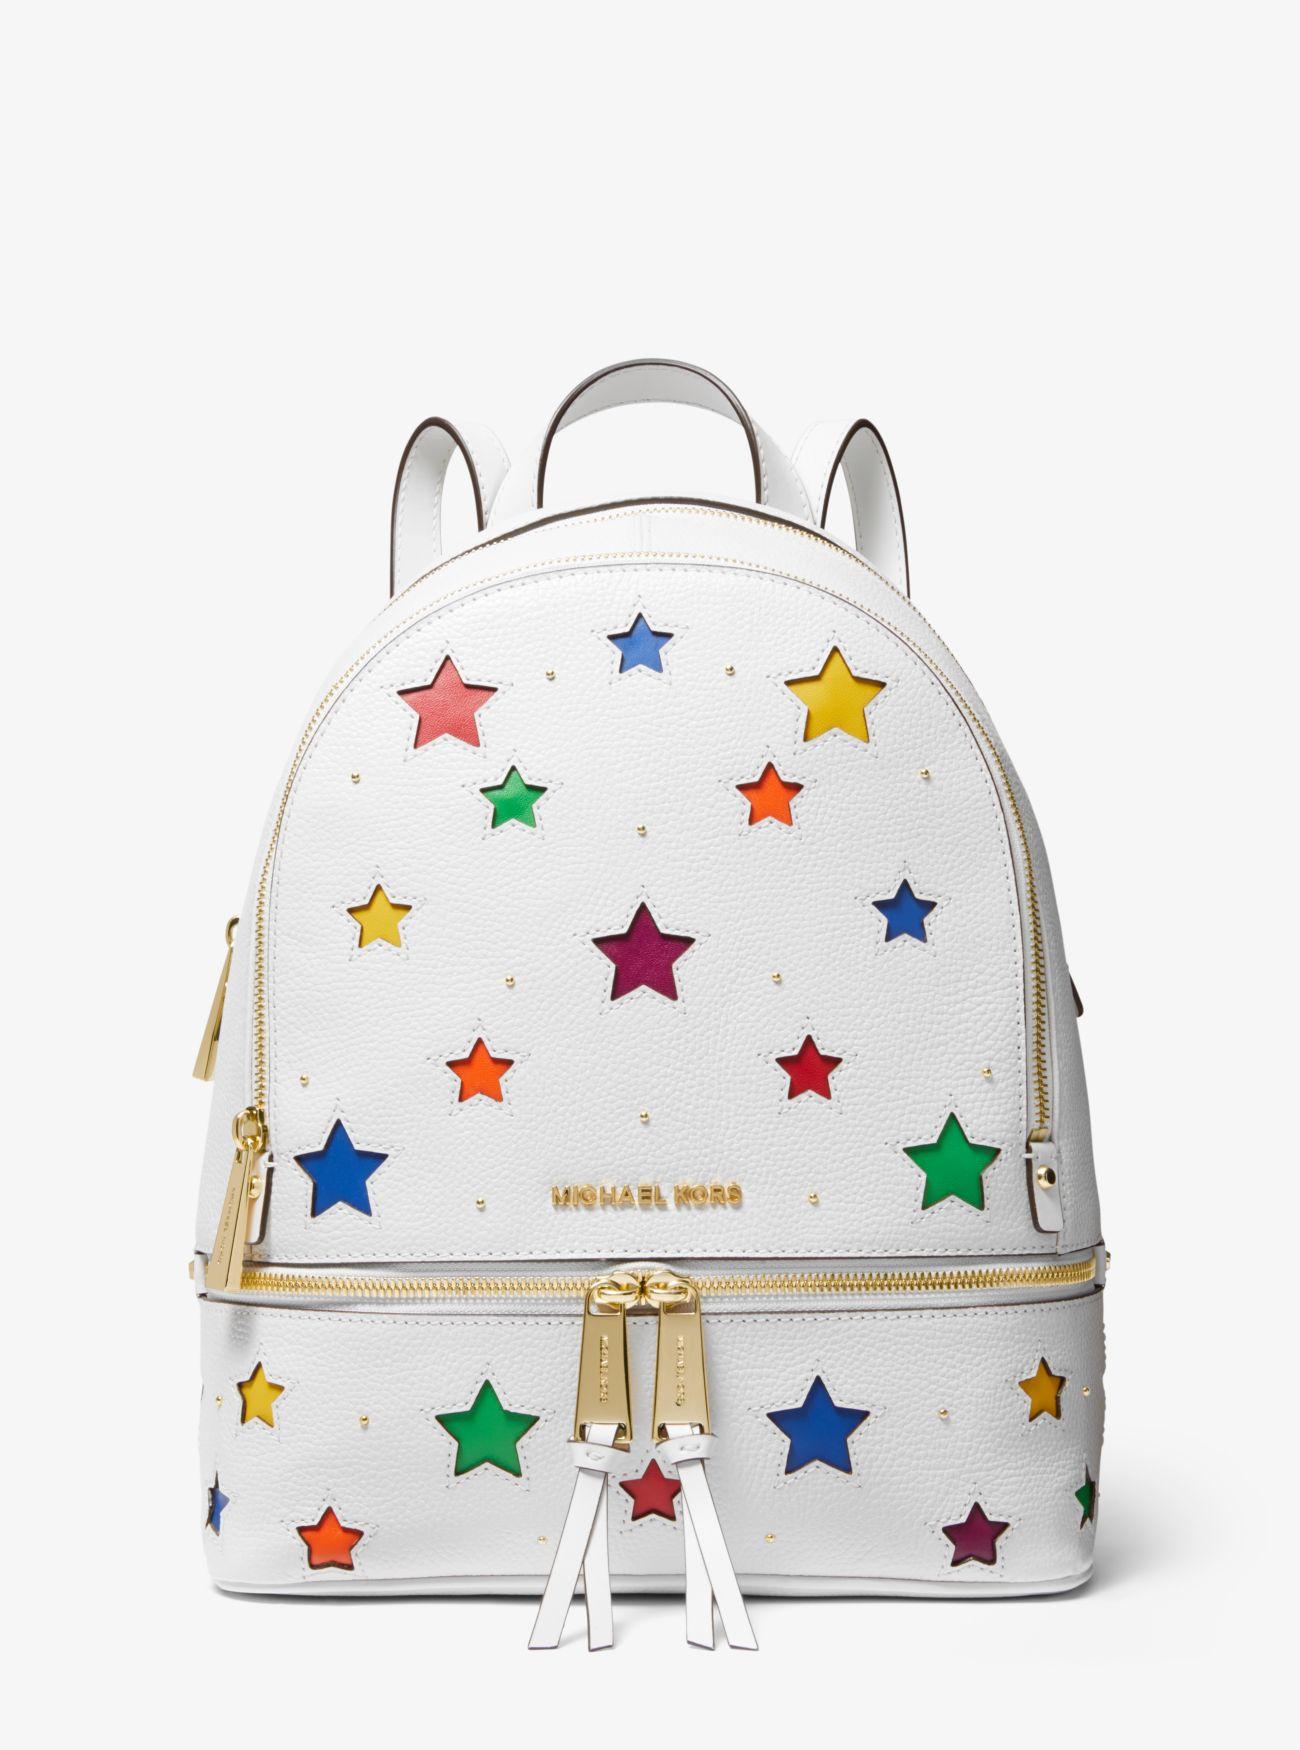 8ce5cac7a021b Rhea Medium Star-Cutout Pebbled Leather Backpack ...